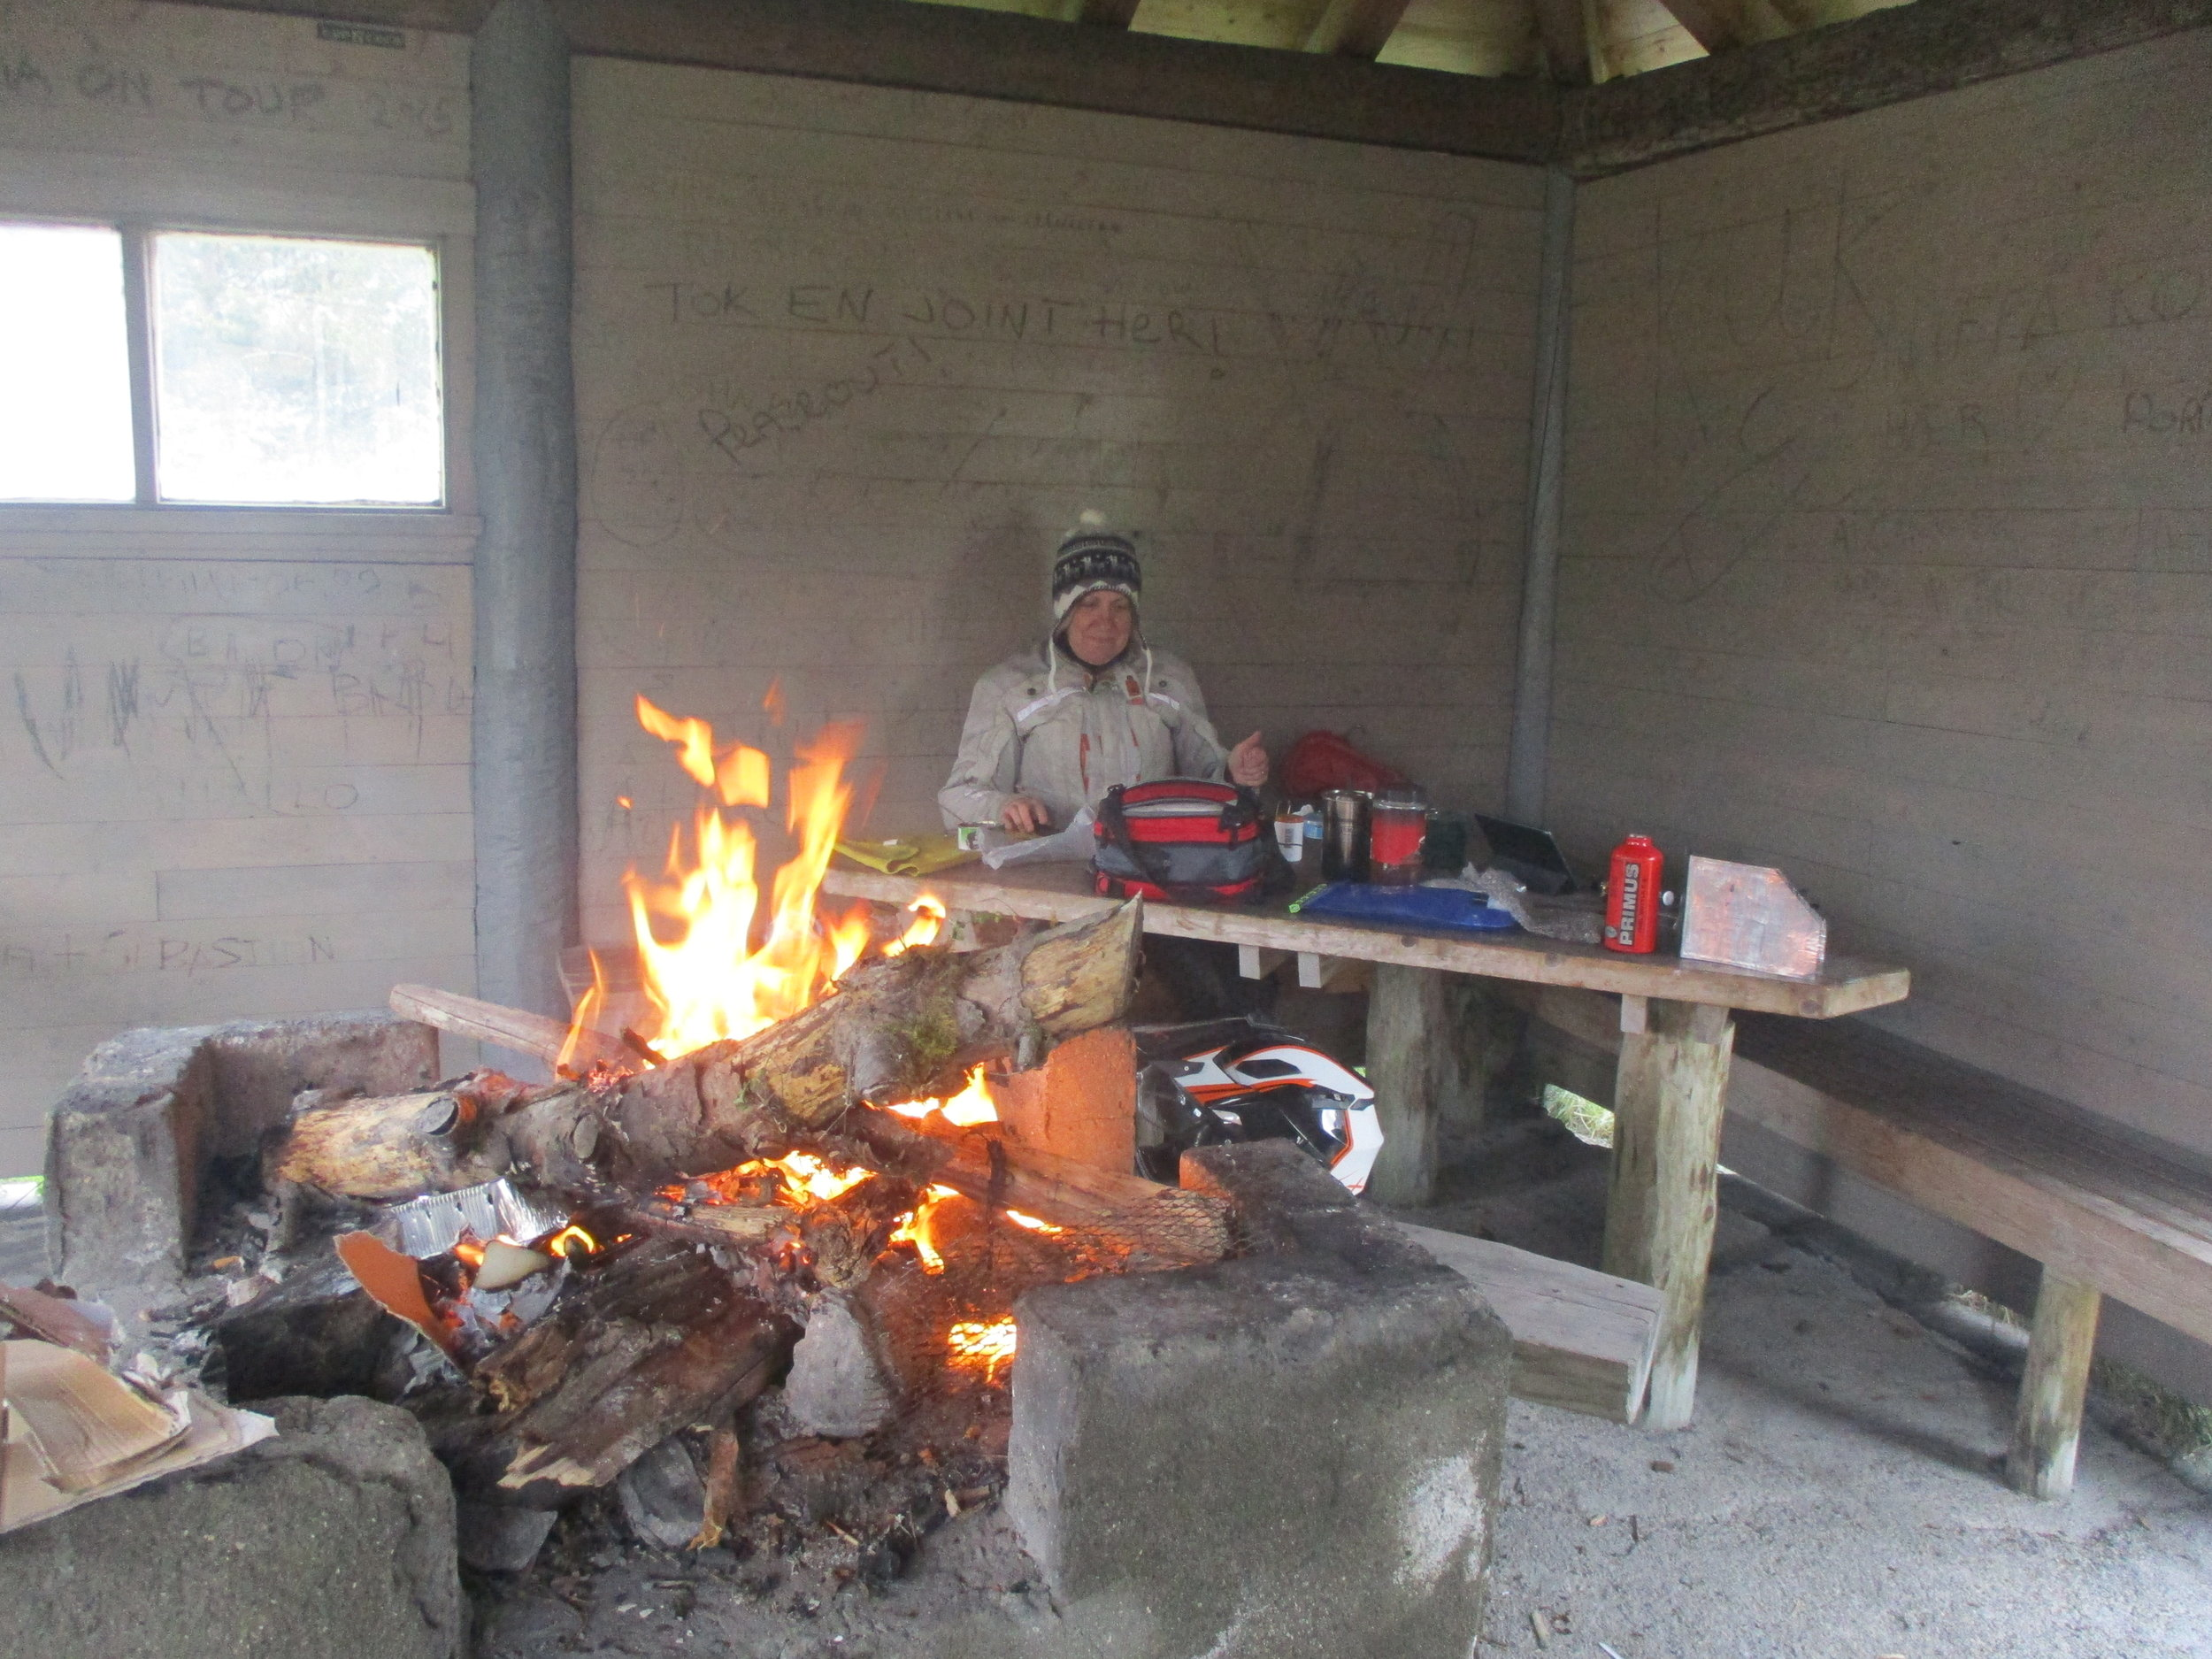 A picnic spot hut with a fire pit.